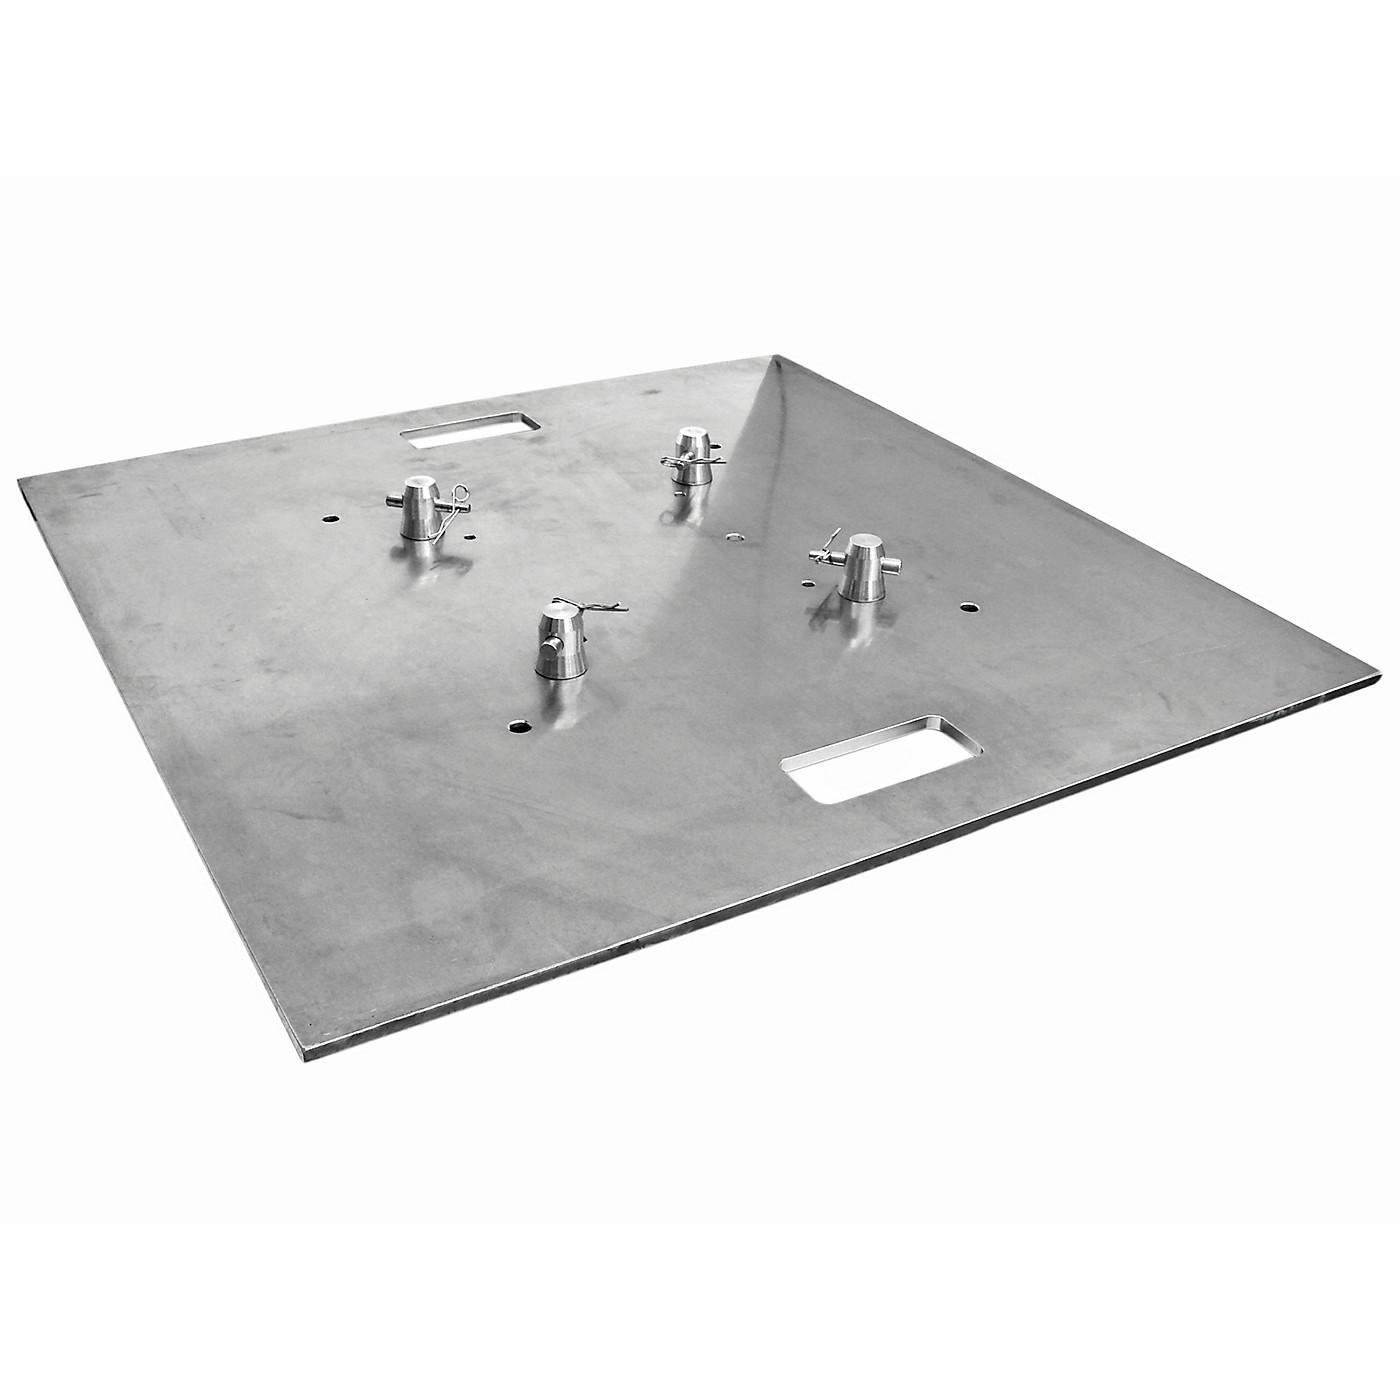 GLOBAL TRUSS BASEPLATE30X30A 30 x 30 In. Aluminum Base Plate thumbnail